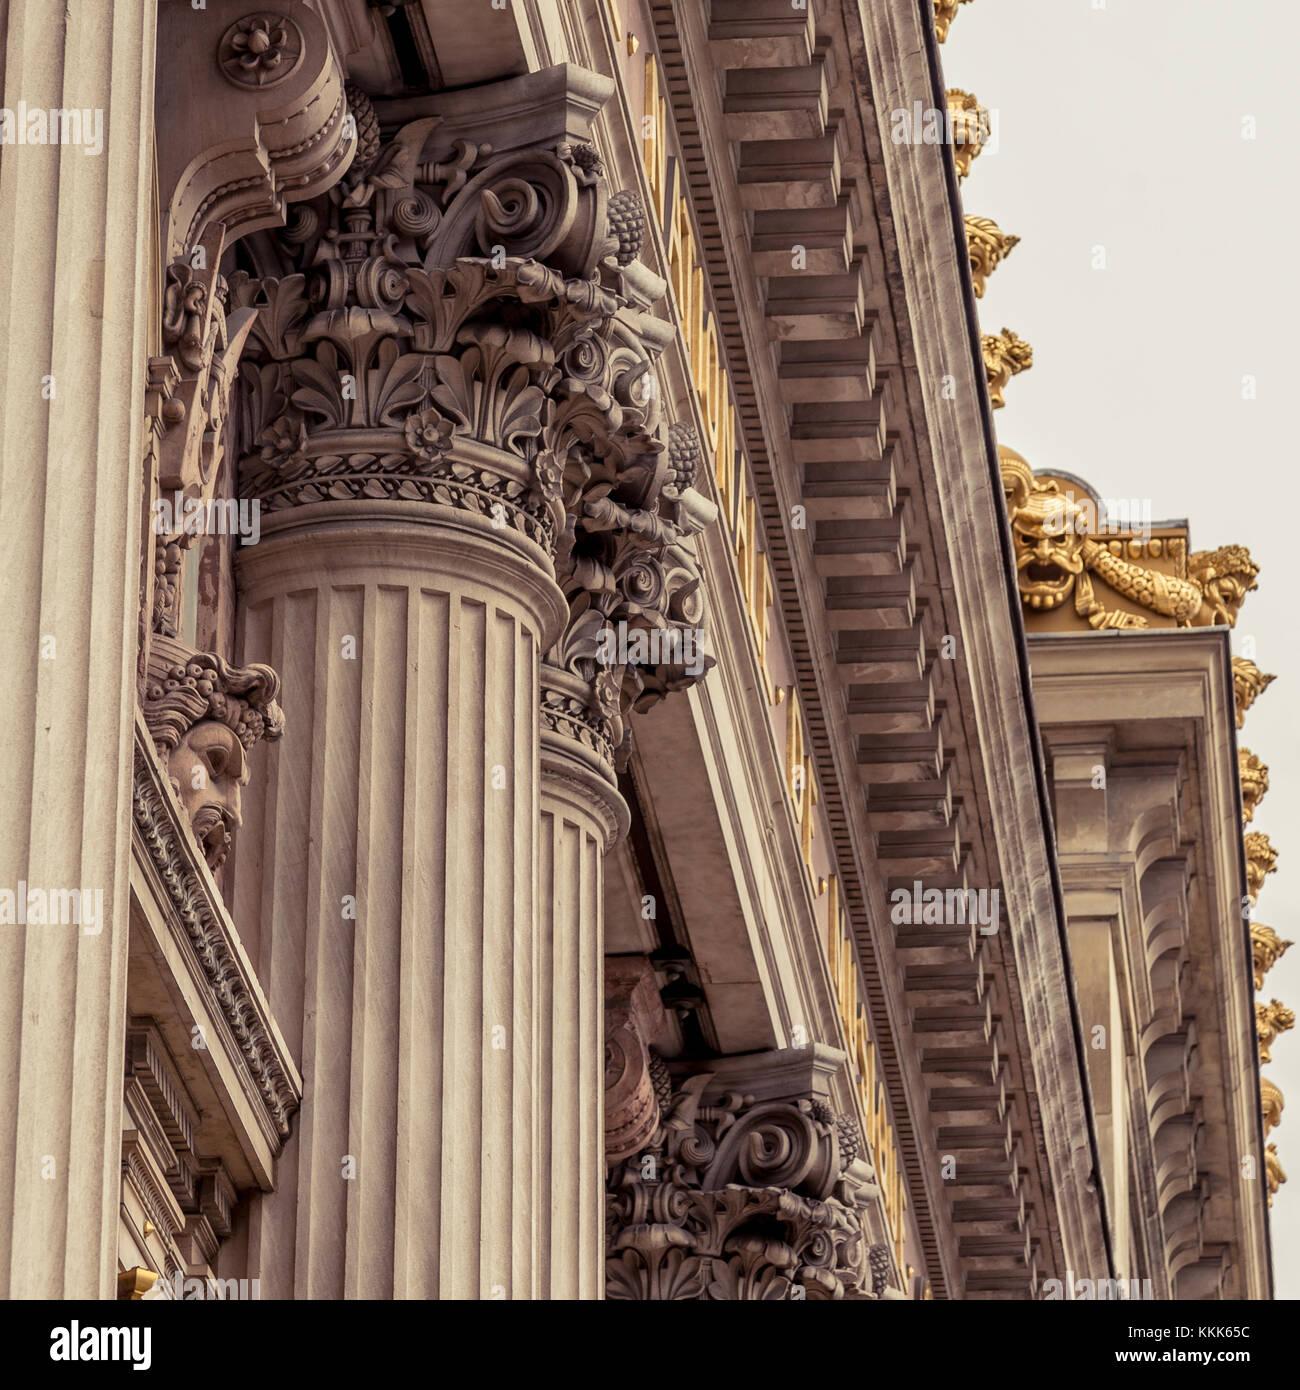 Corinthian column capital featuring acanthus leaves - Stock Image